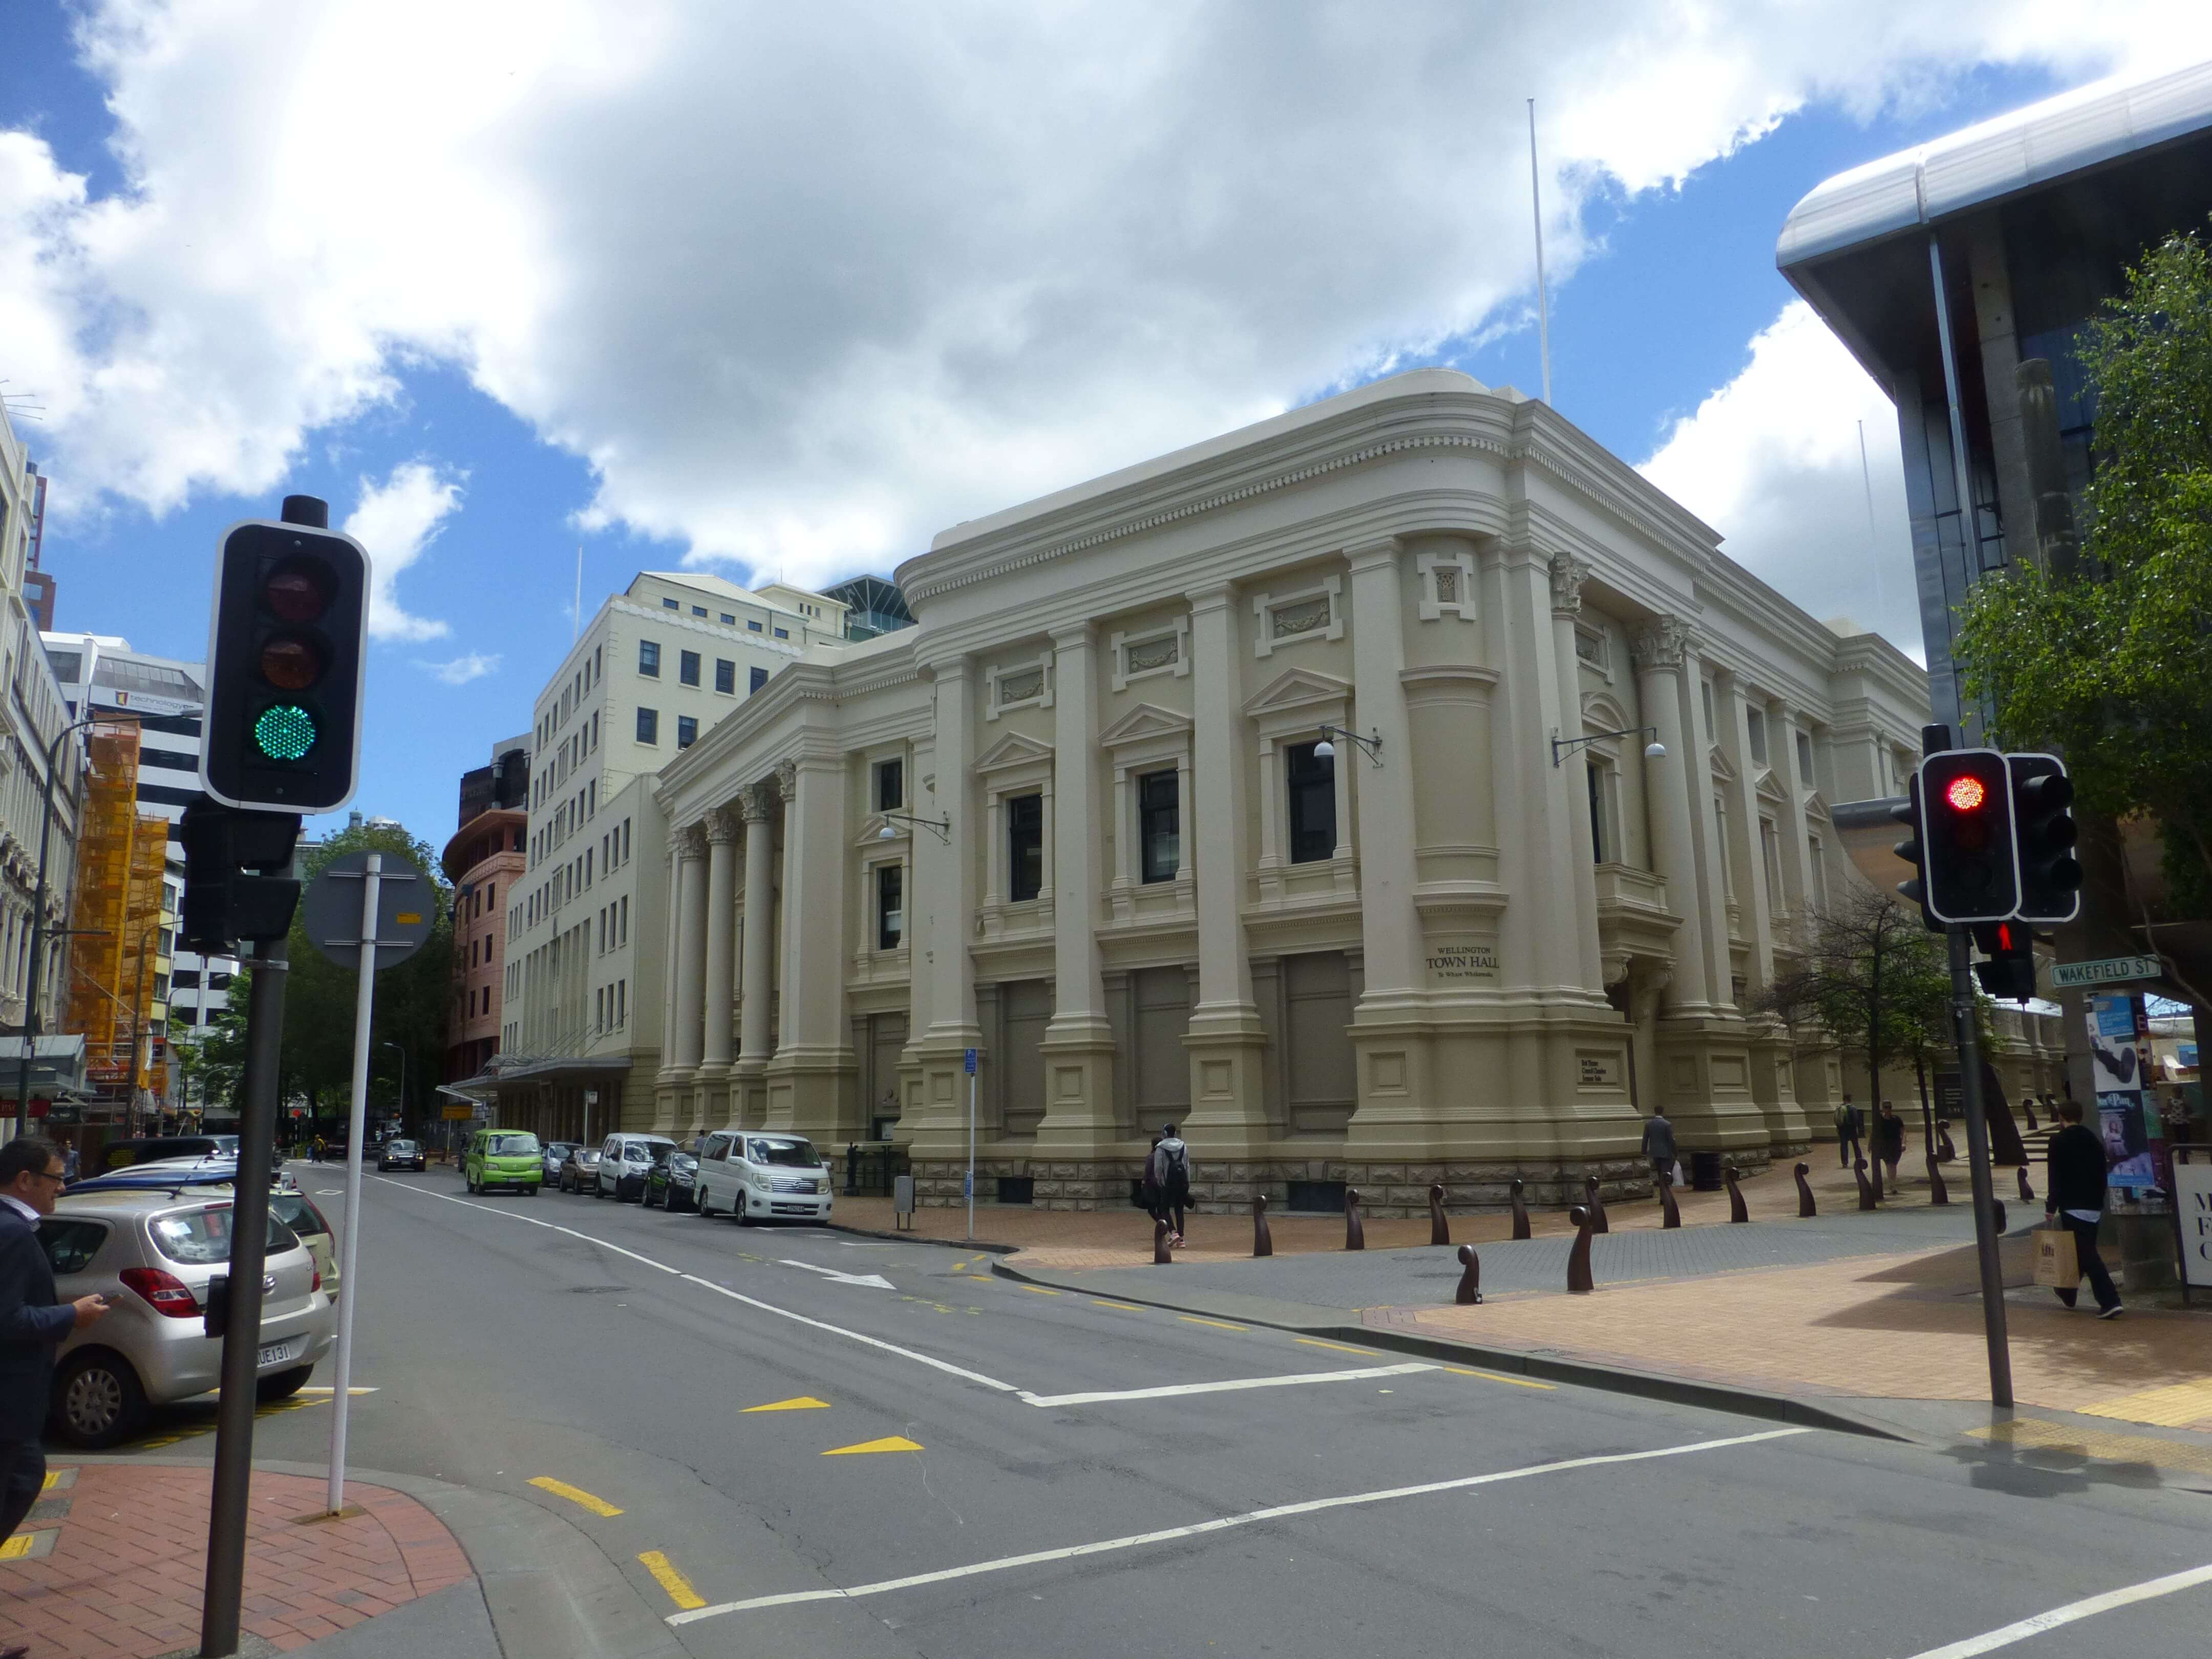 im Zentrum, Wellington, Neuseeland, Weit-weg.reisen 12